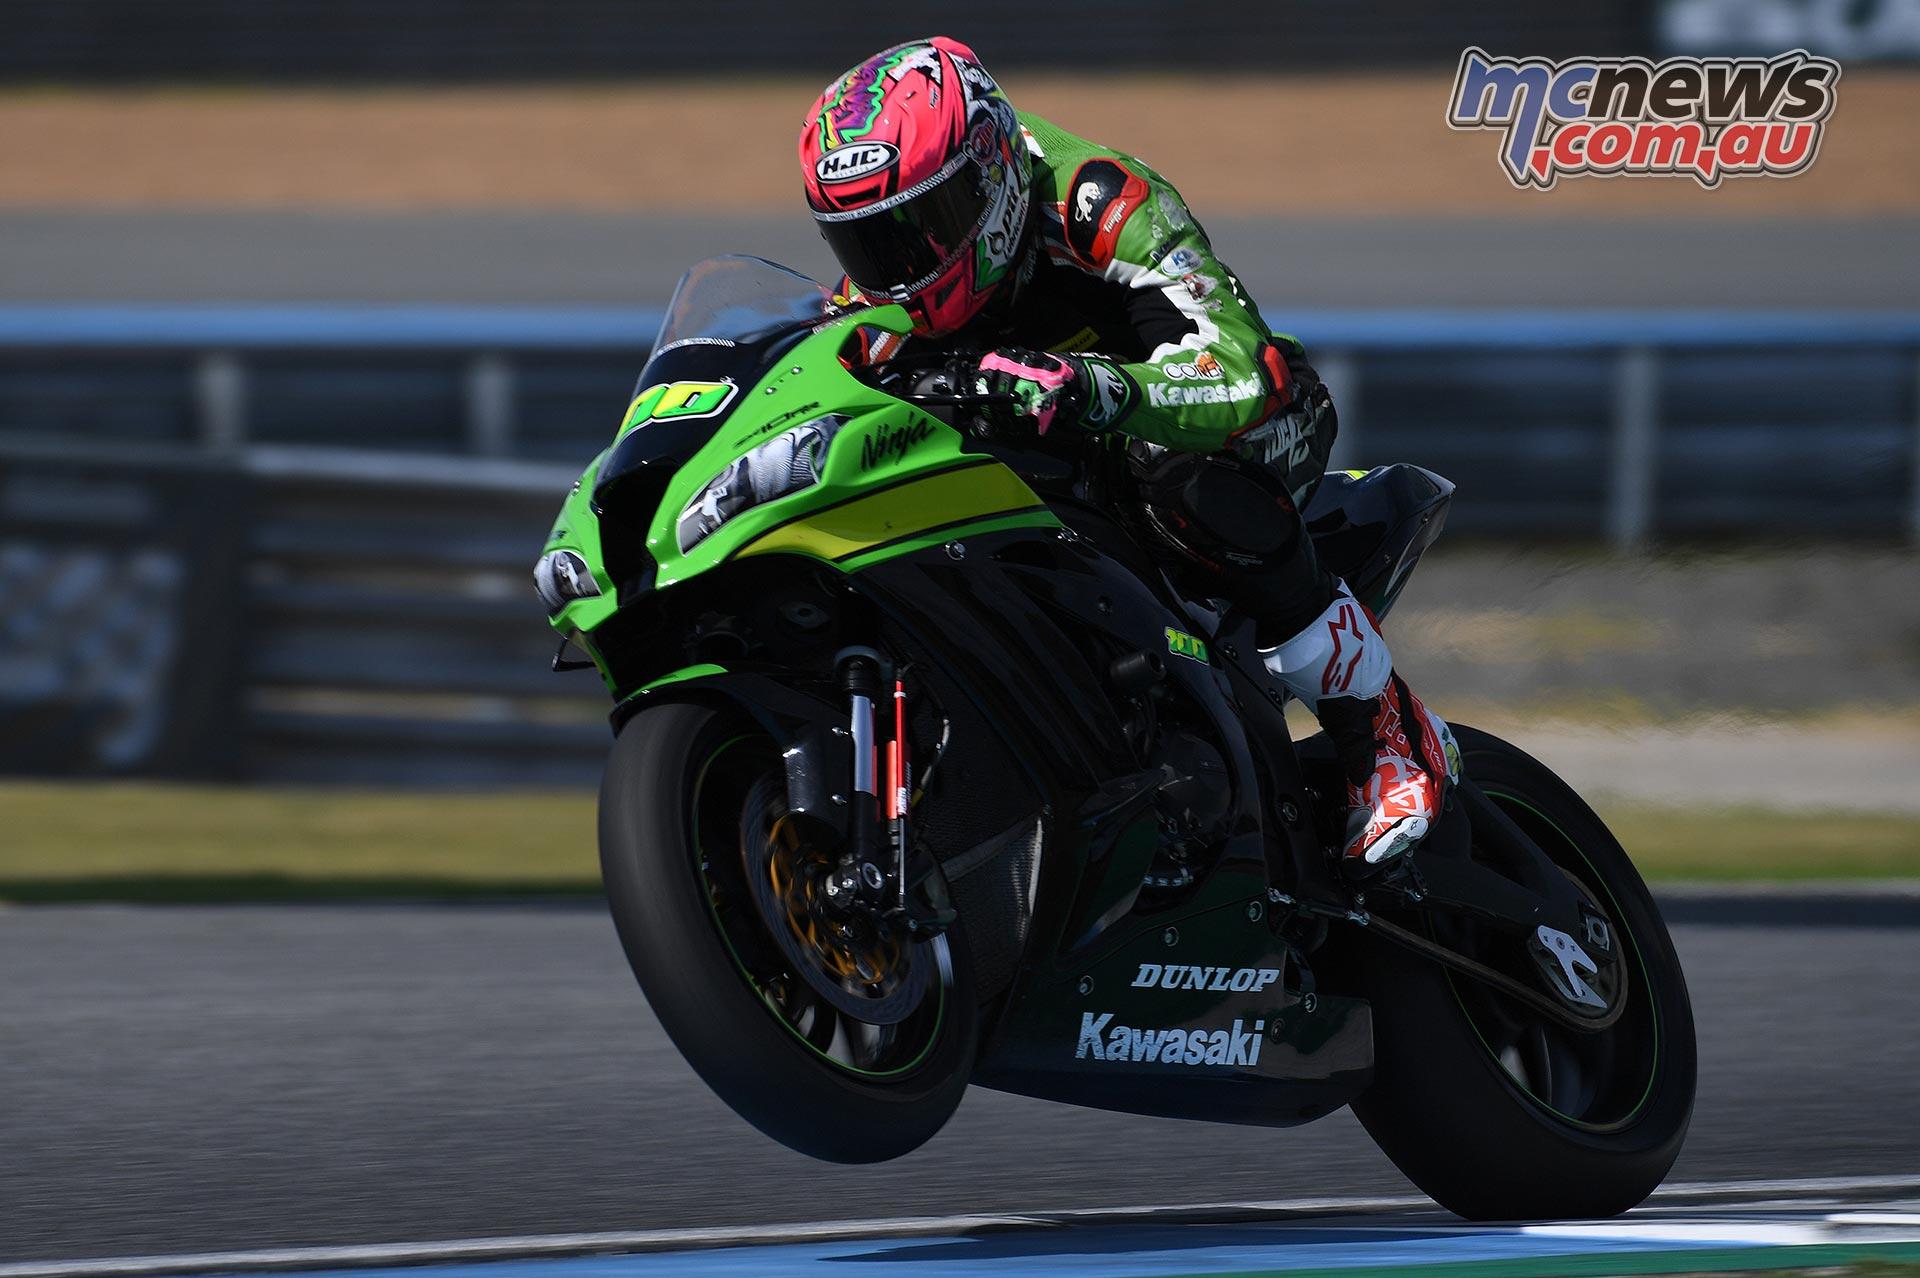 Glenn Allerton Excited To Join FIM ARRC Superbike In 2019